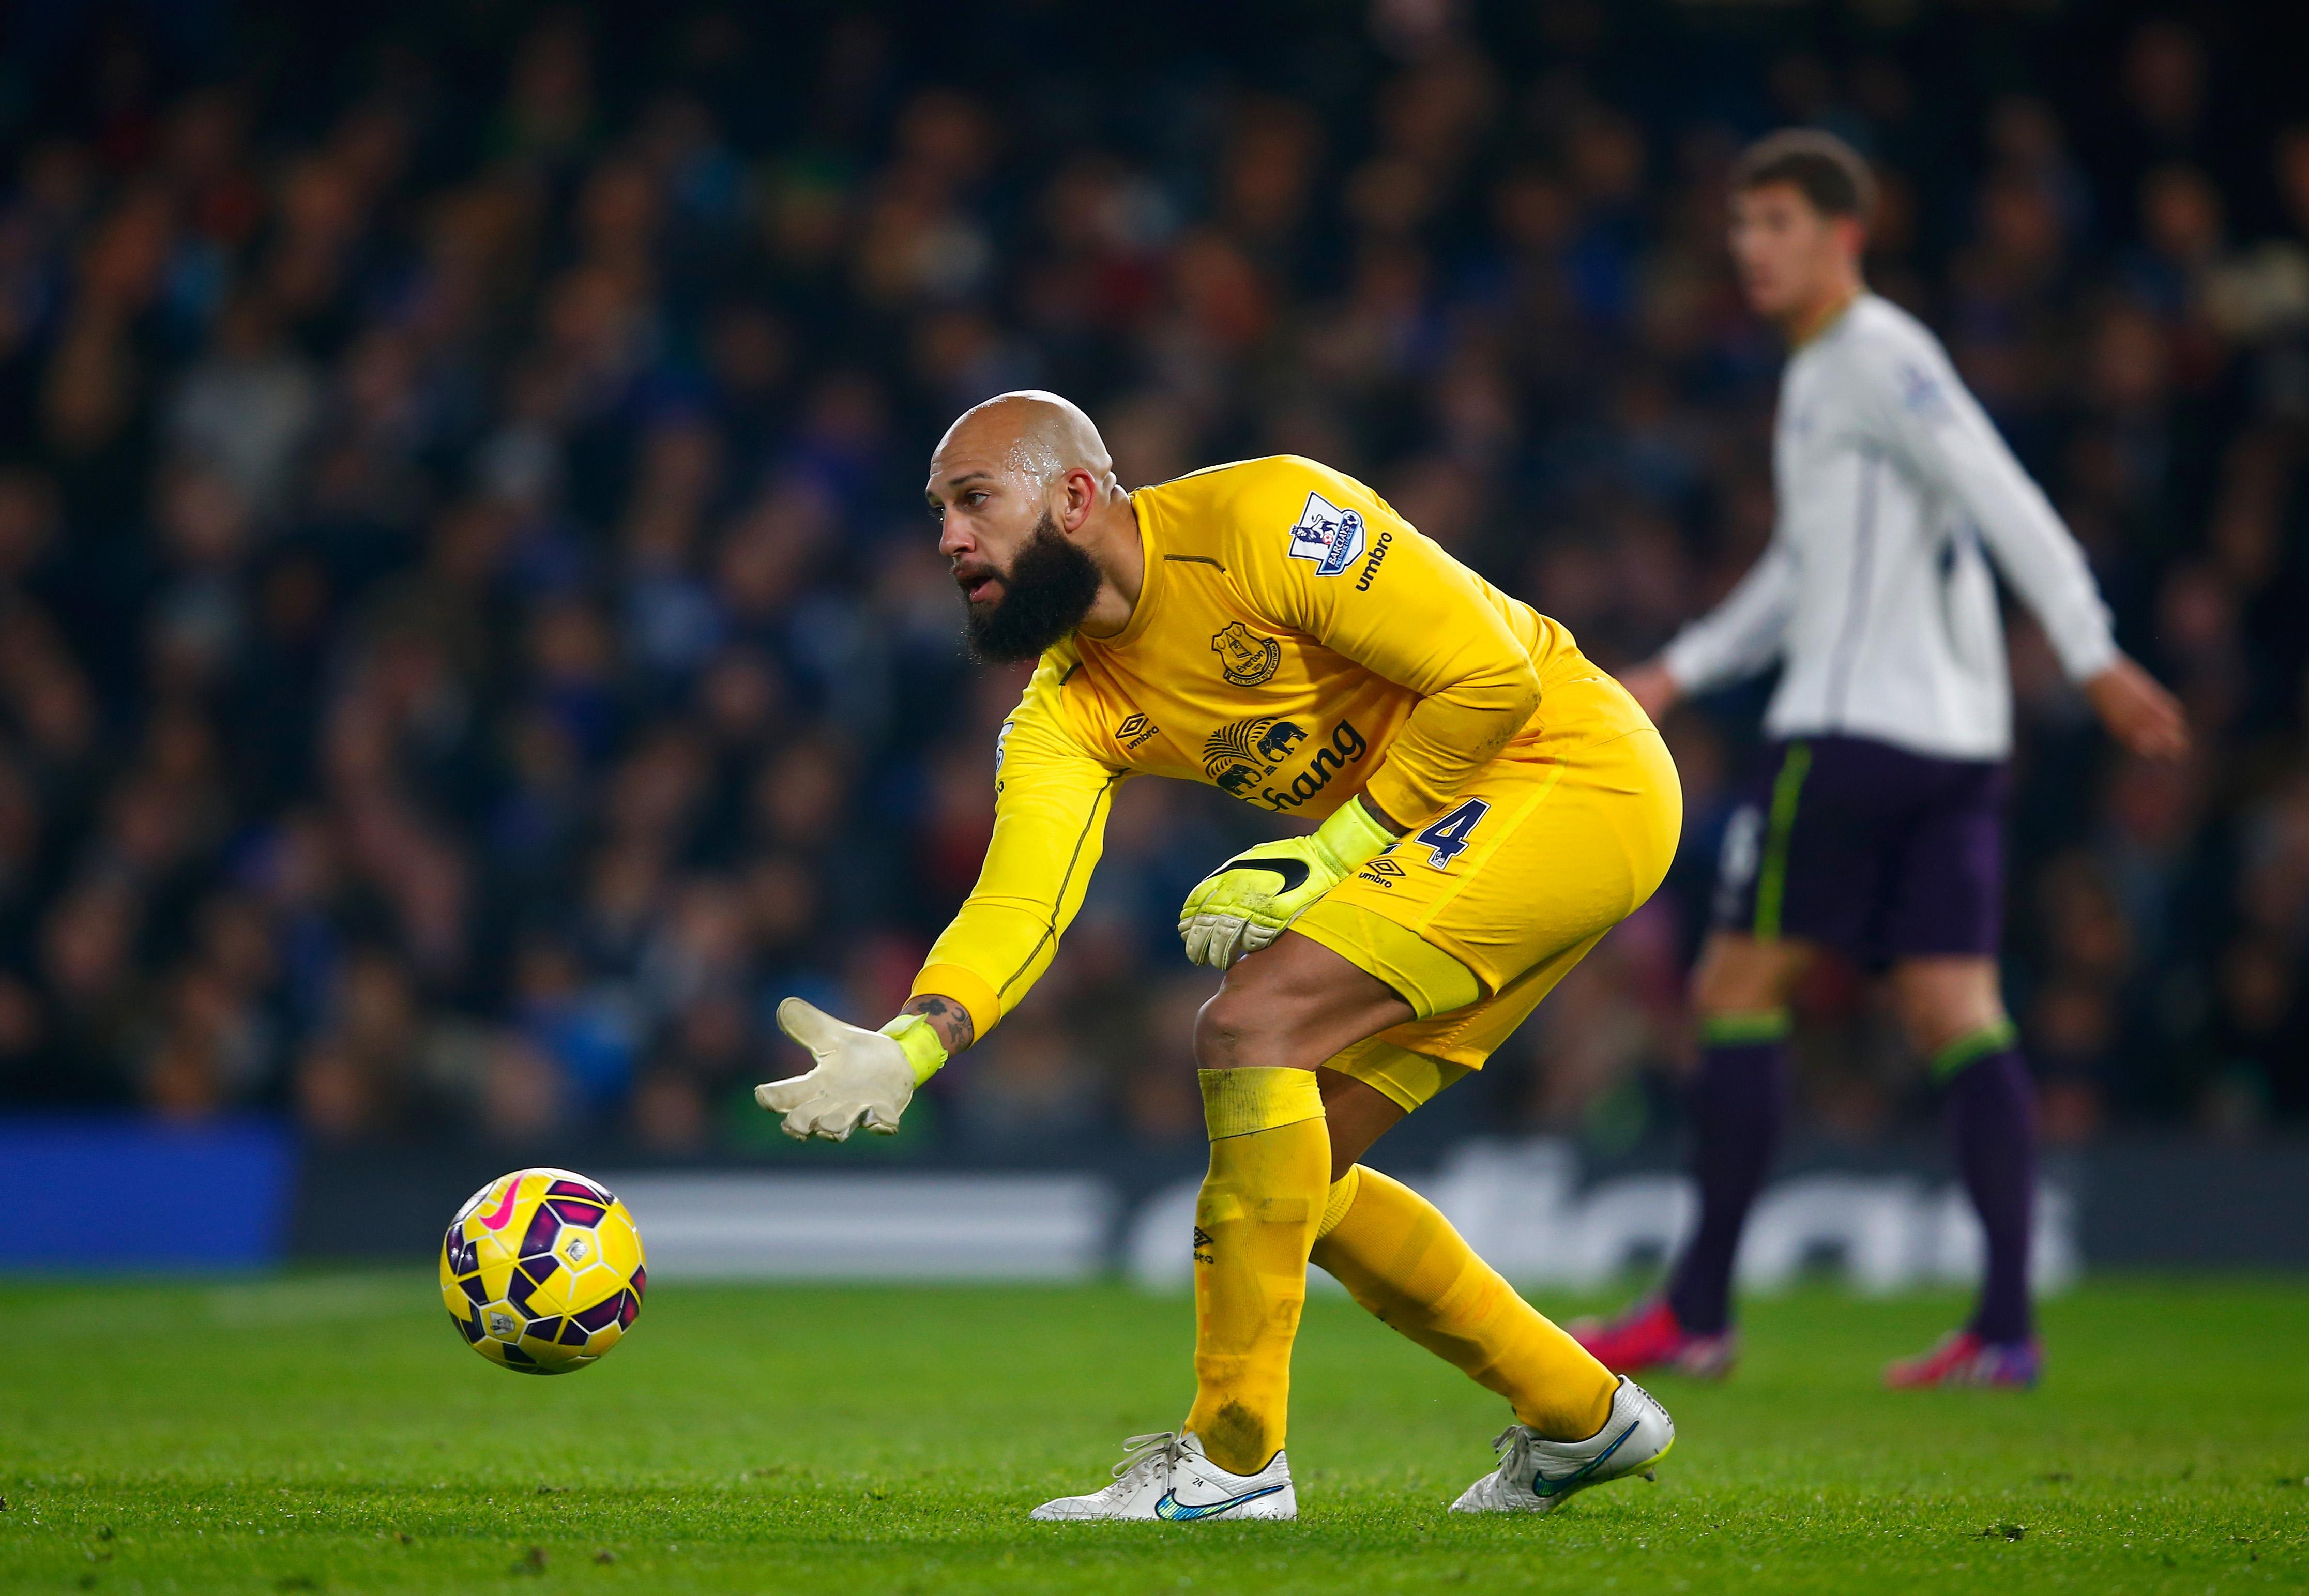 Tim Howard Everton Chelsea (Getty Images)